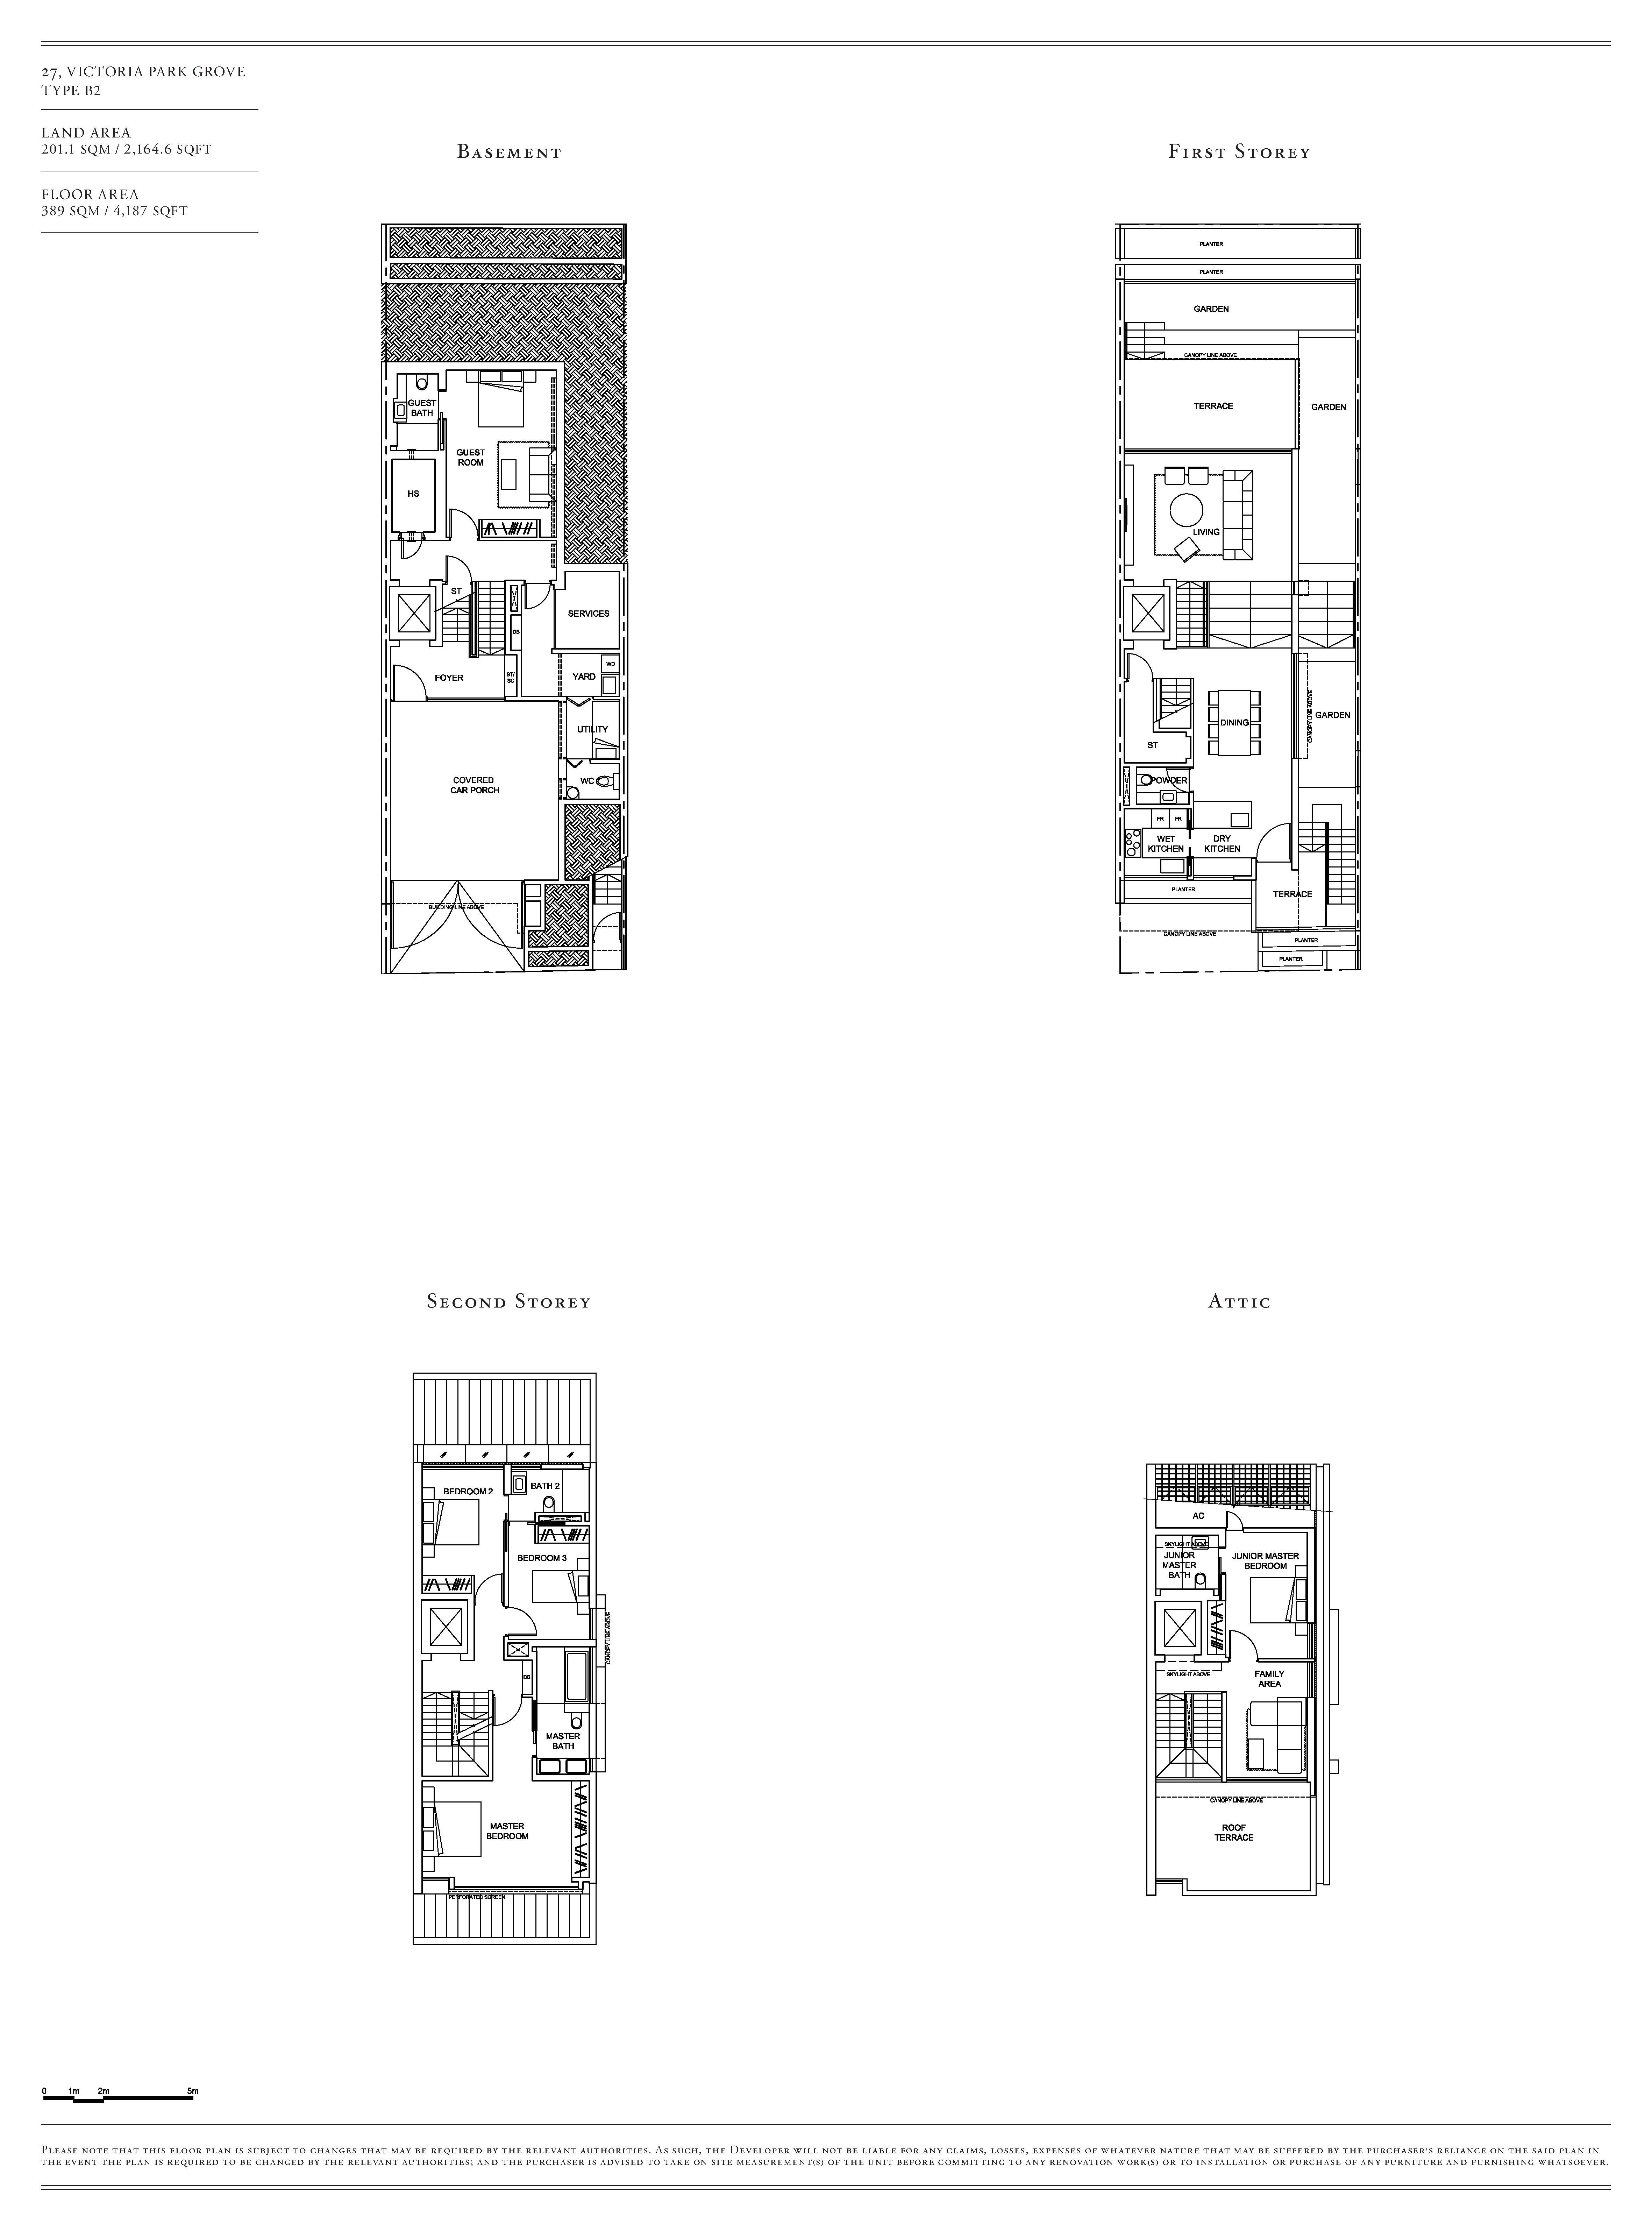 Victoria Park Villas House 27 Type B2 Floor Plans